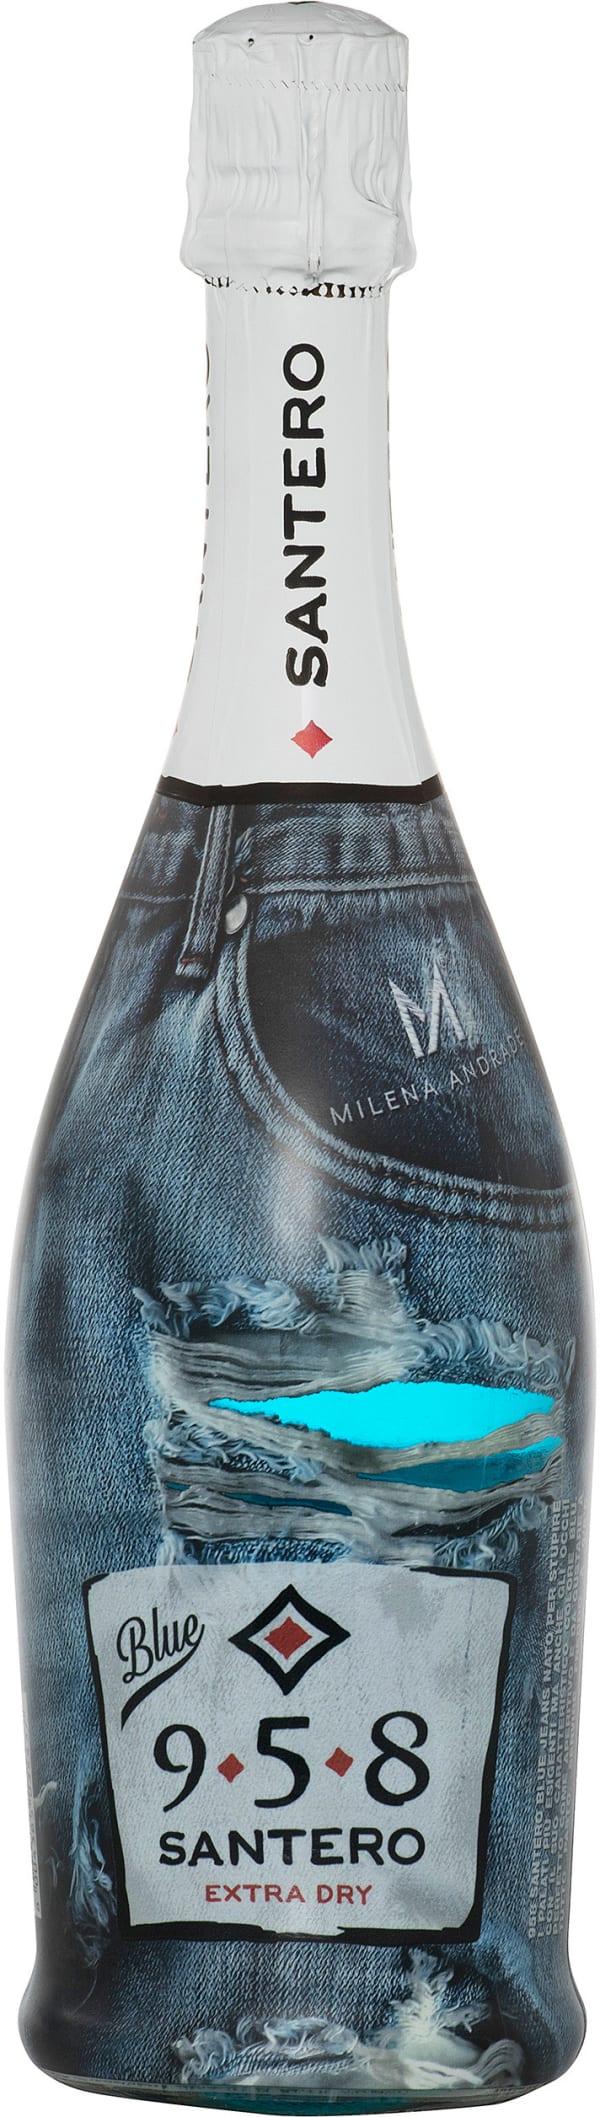 Santero 958 Blue Jeans Extra Dry